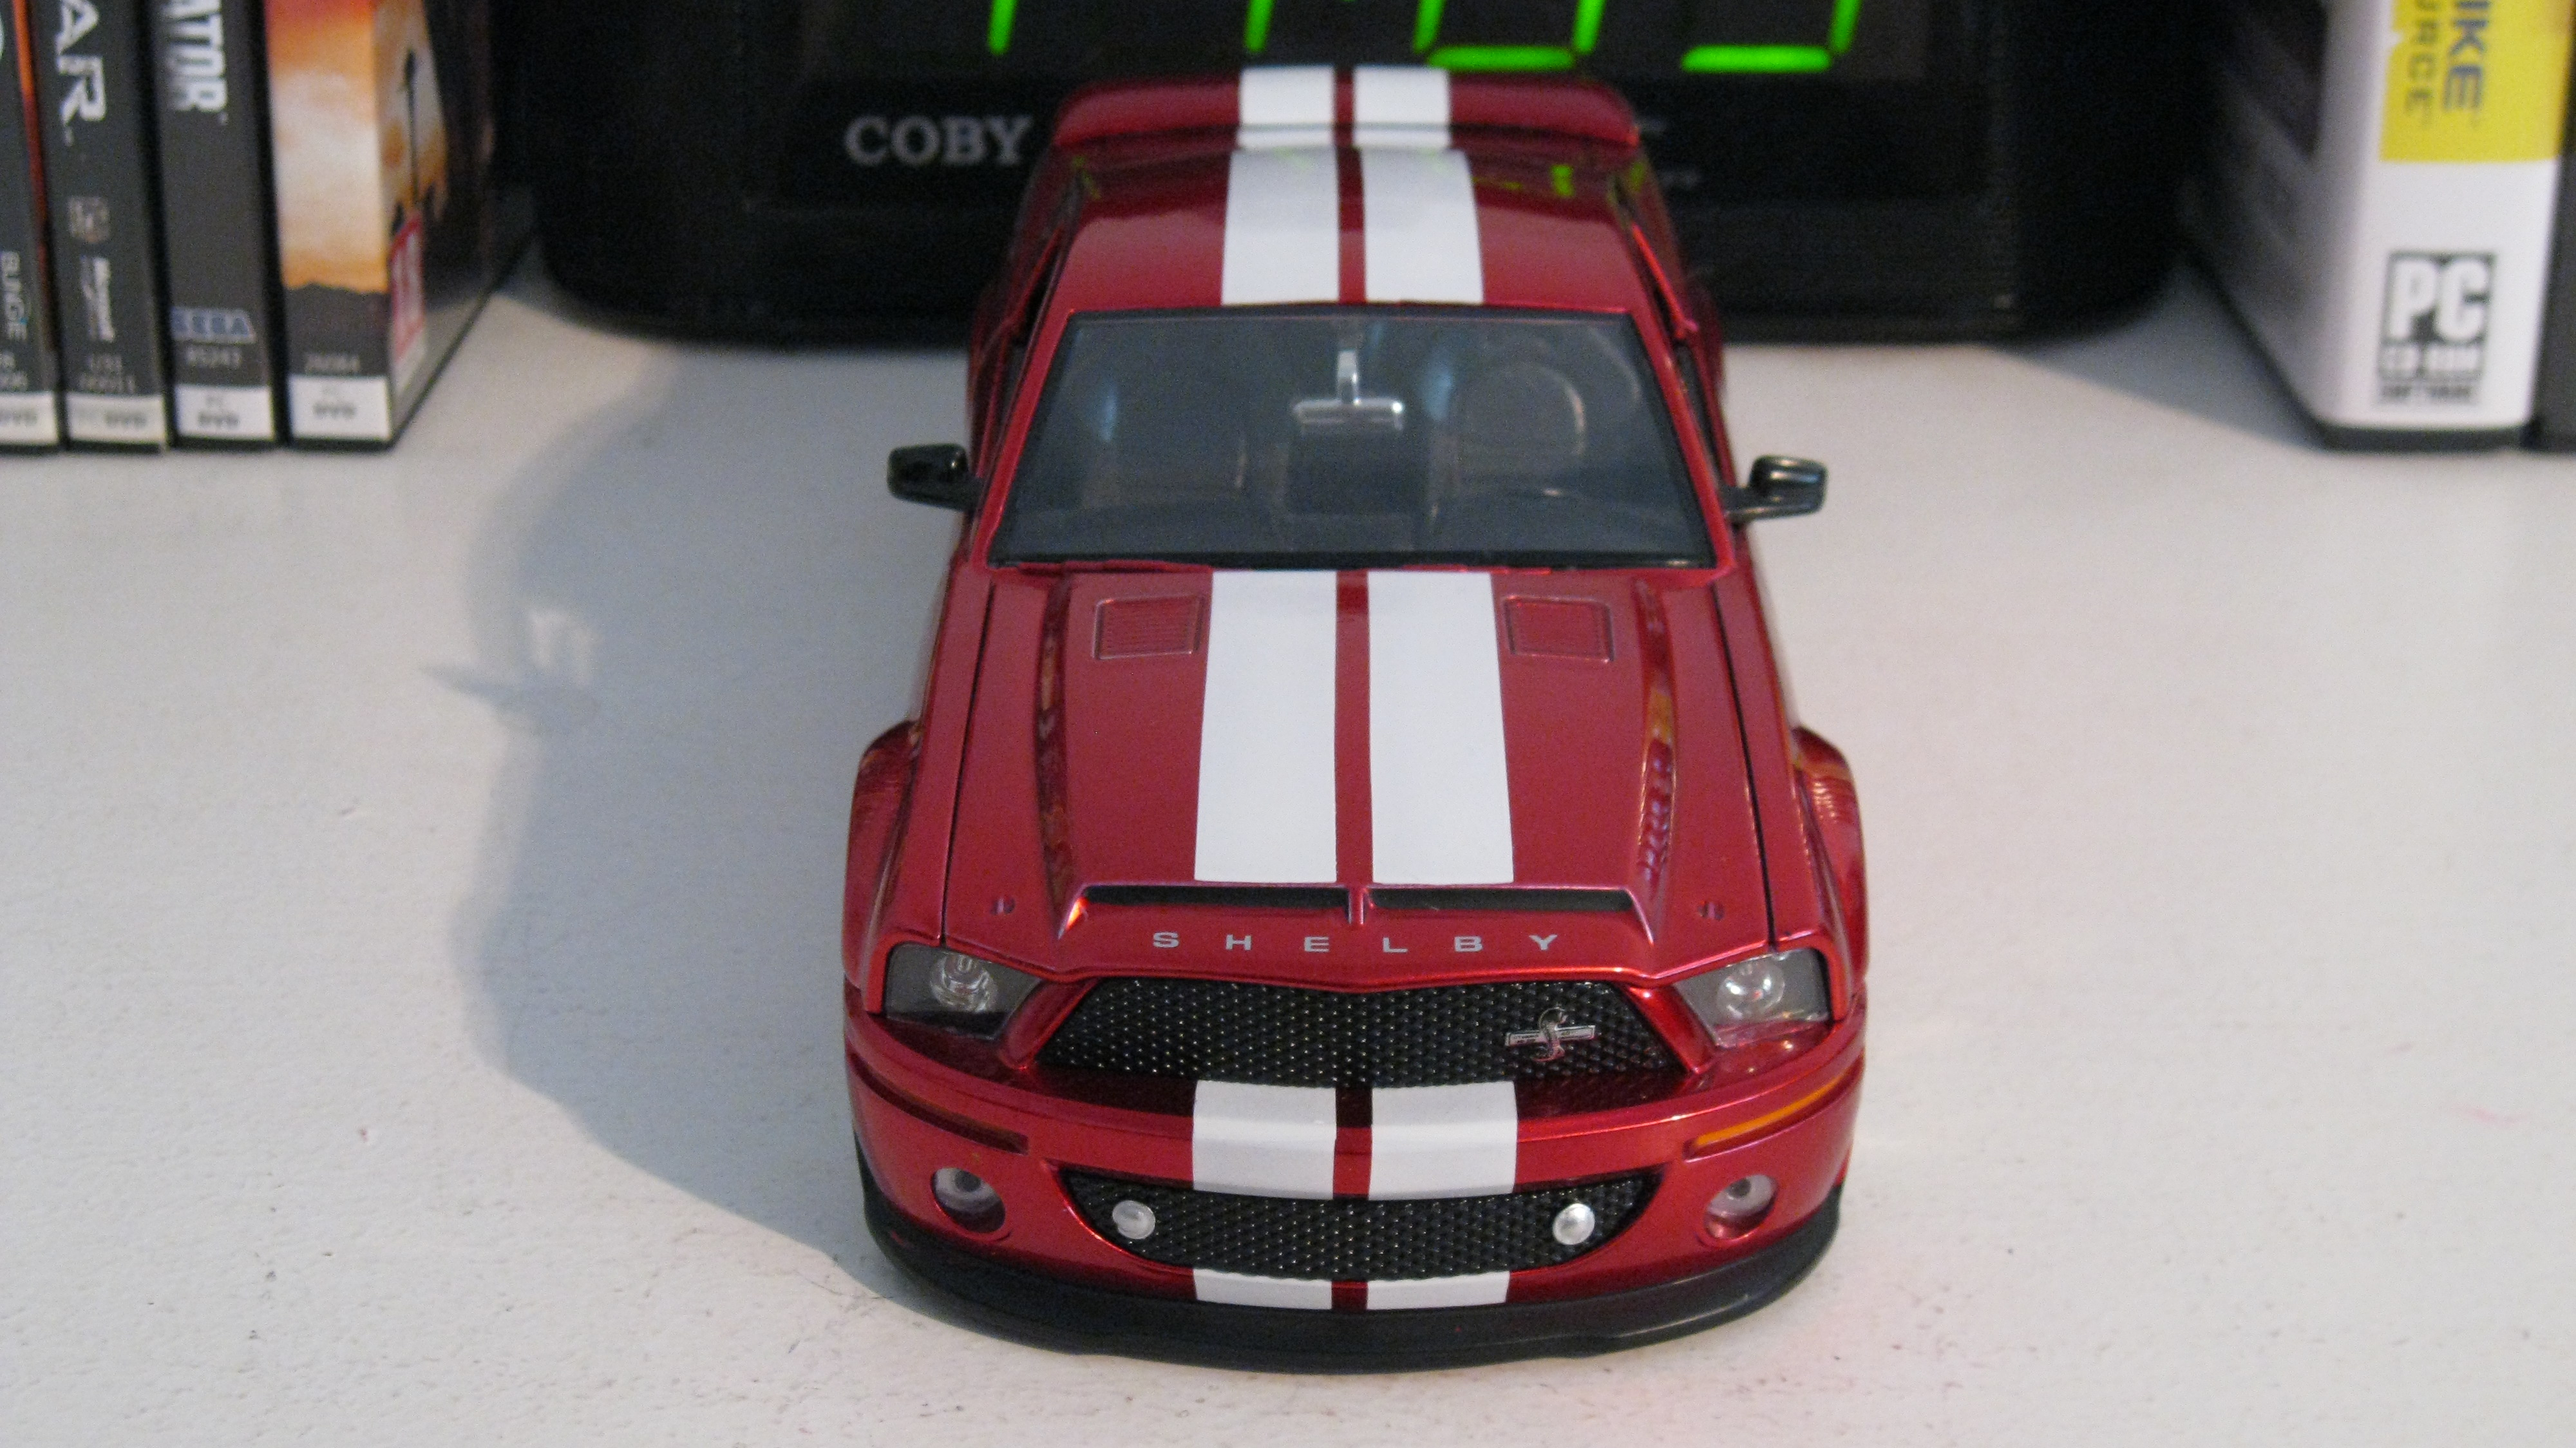 Mi Coleccion De Autos Autos A Escala 1 9 Imagenes De Autos